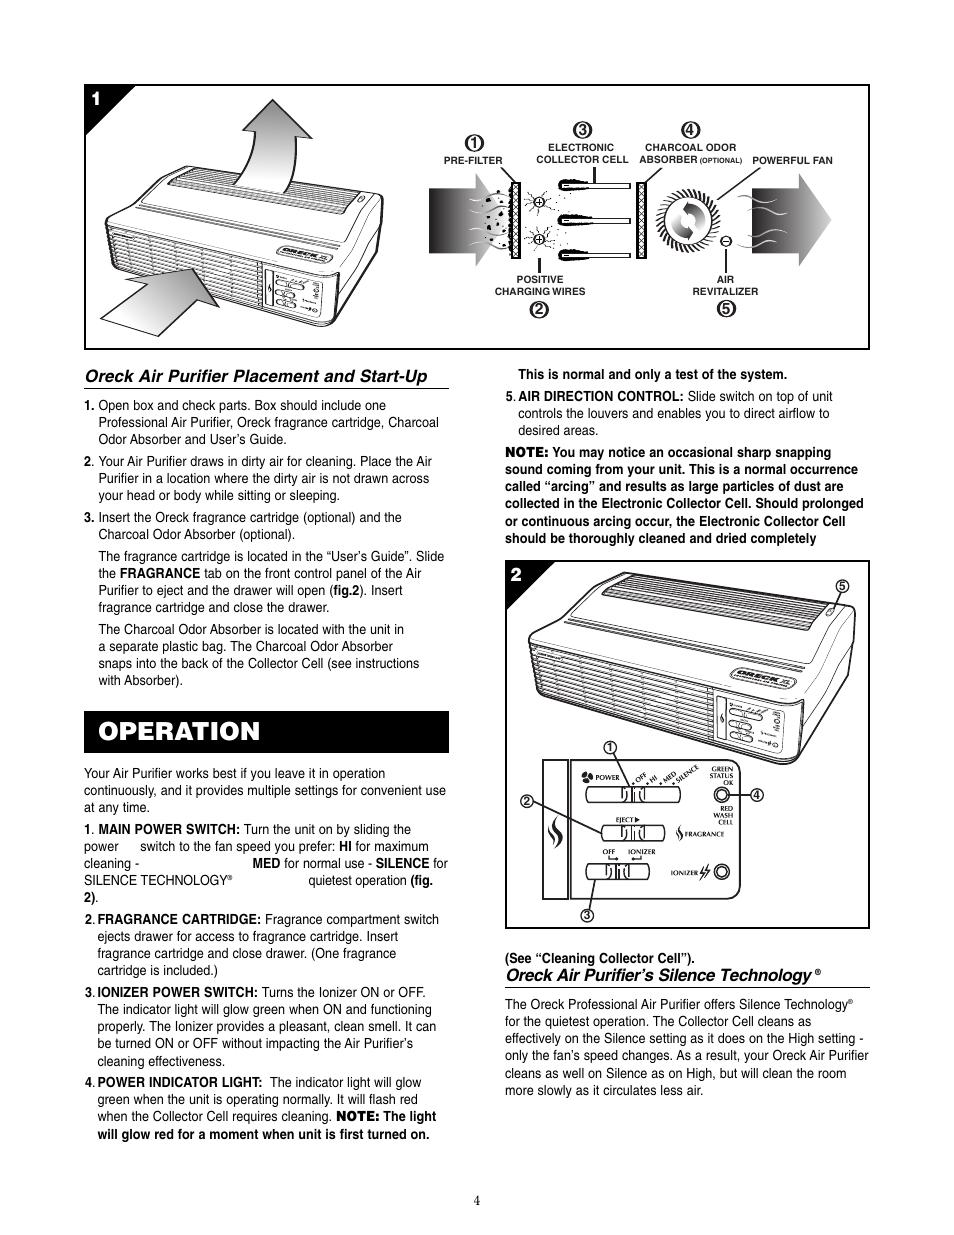 medium resolution of operation oreck air purifier placement and start up oreck air purifier s silence technology oreck xl rofessional air purifier air8 series user manual